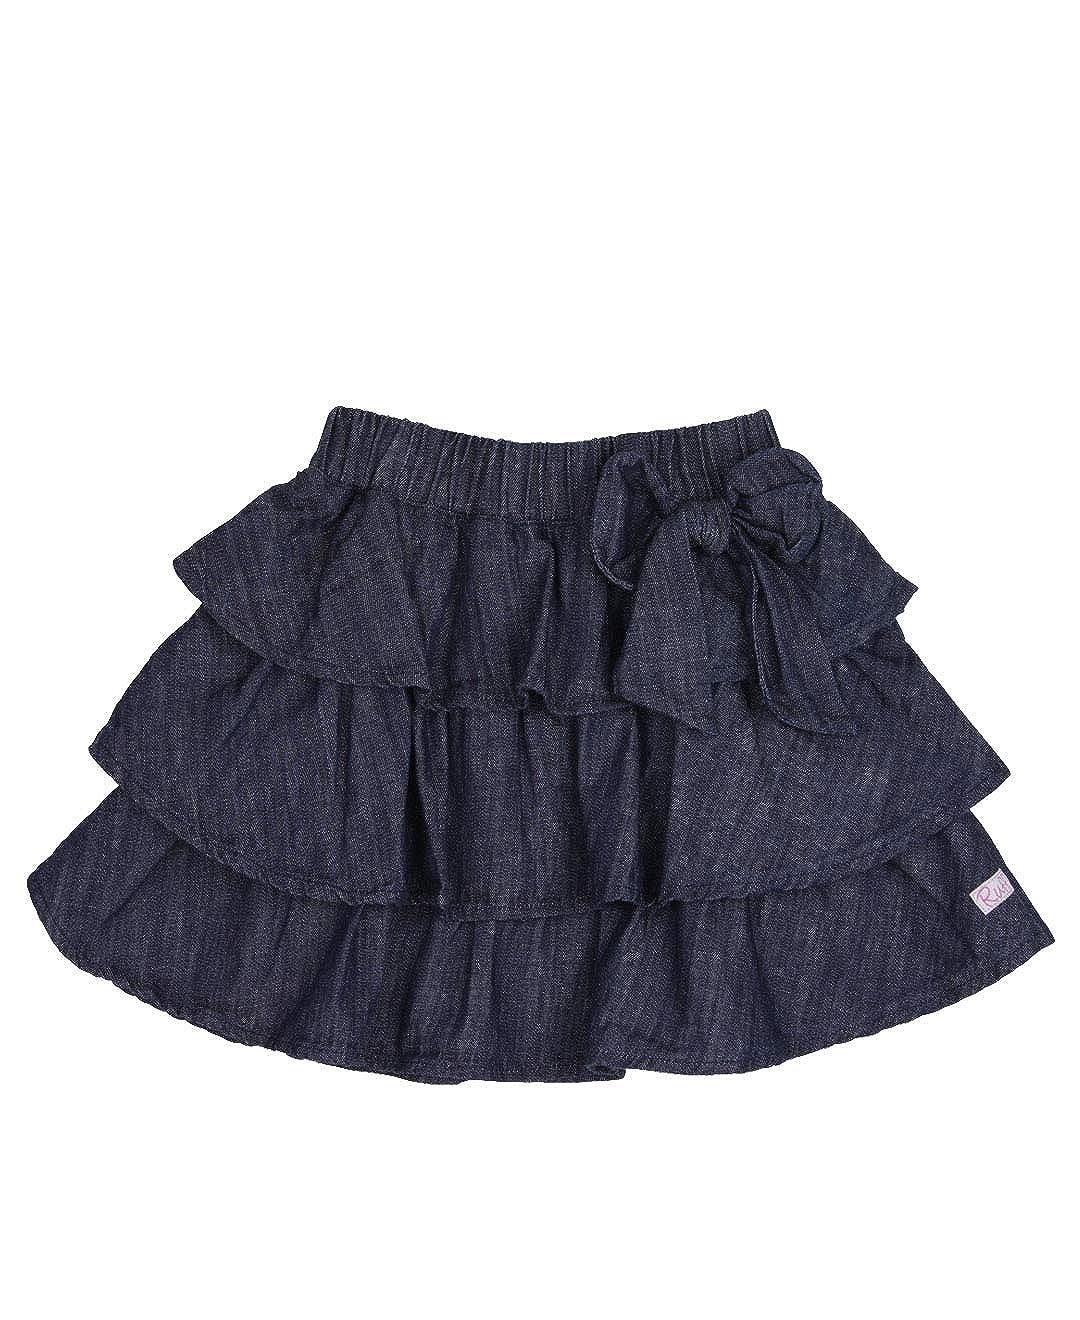 RuffleButts Baby//Toddler Girls Ruffled Denim Skirt with Bow SKDYYXX-BWSK-SC-BABY